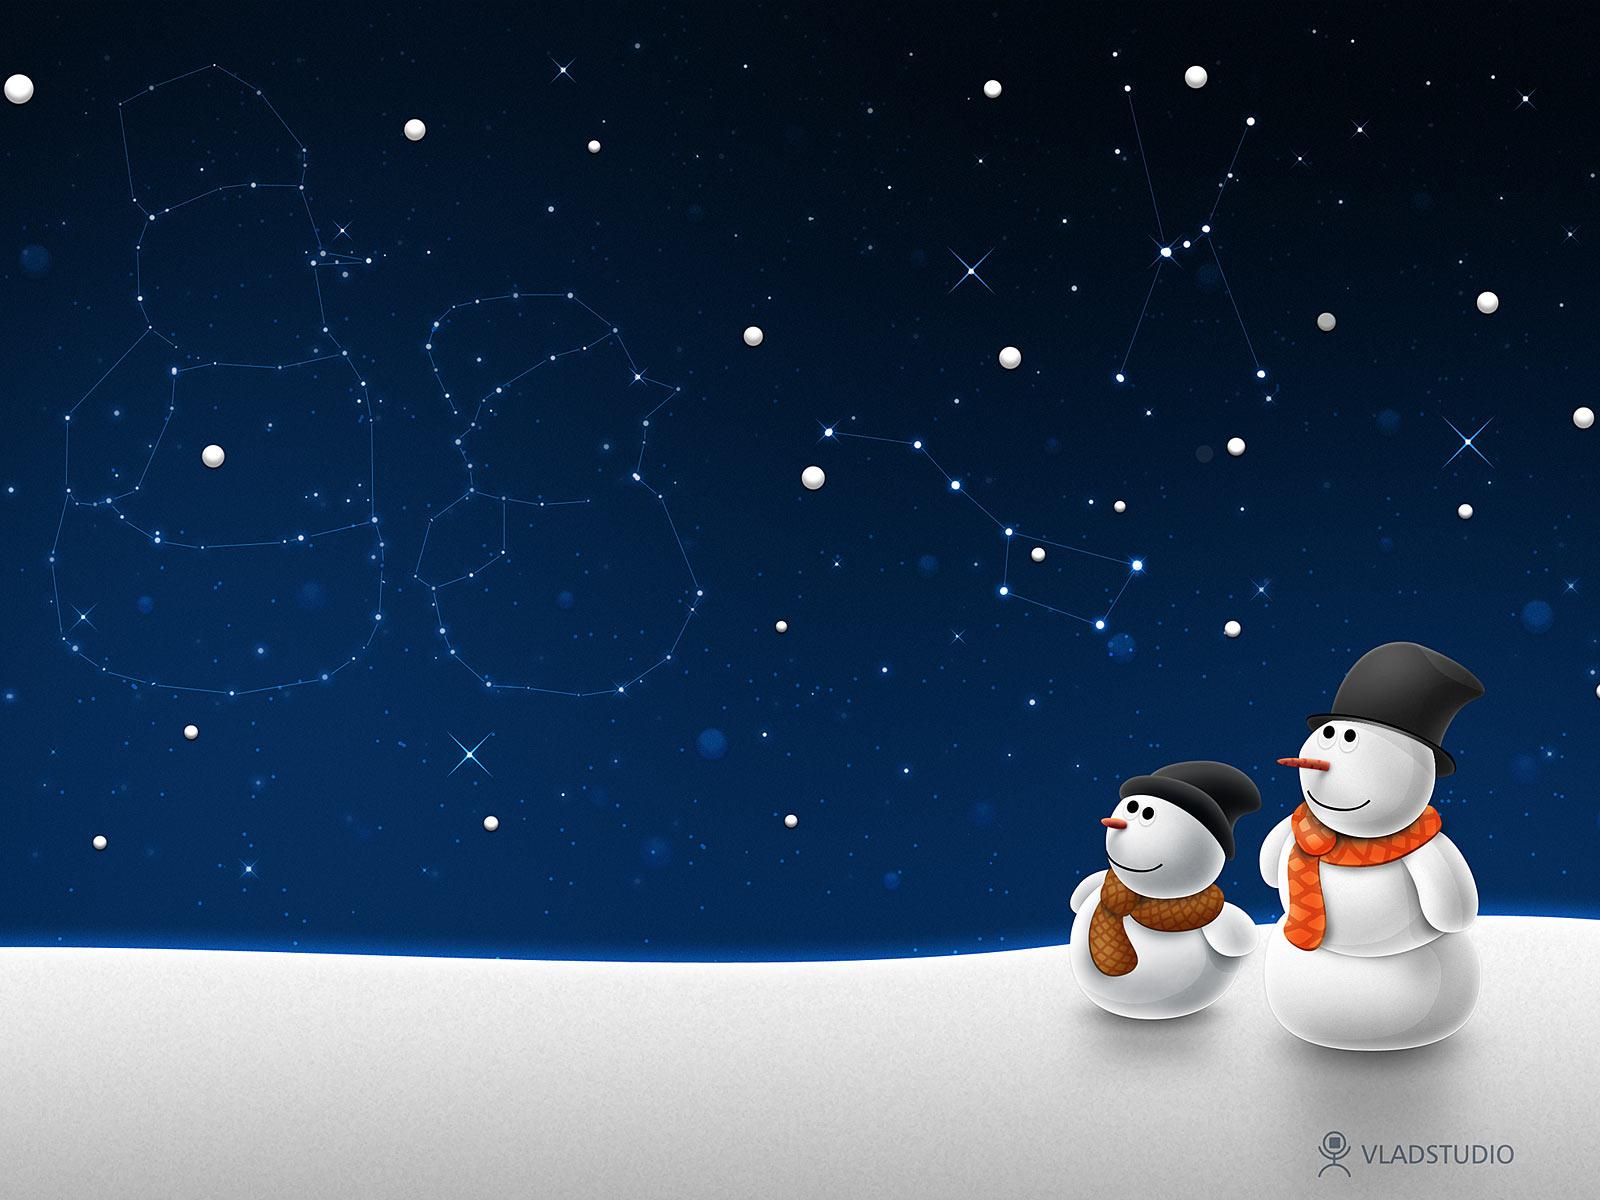 Best Free Christmas Background HD:Computer Wallpaper | Free Wallpaper ...